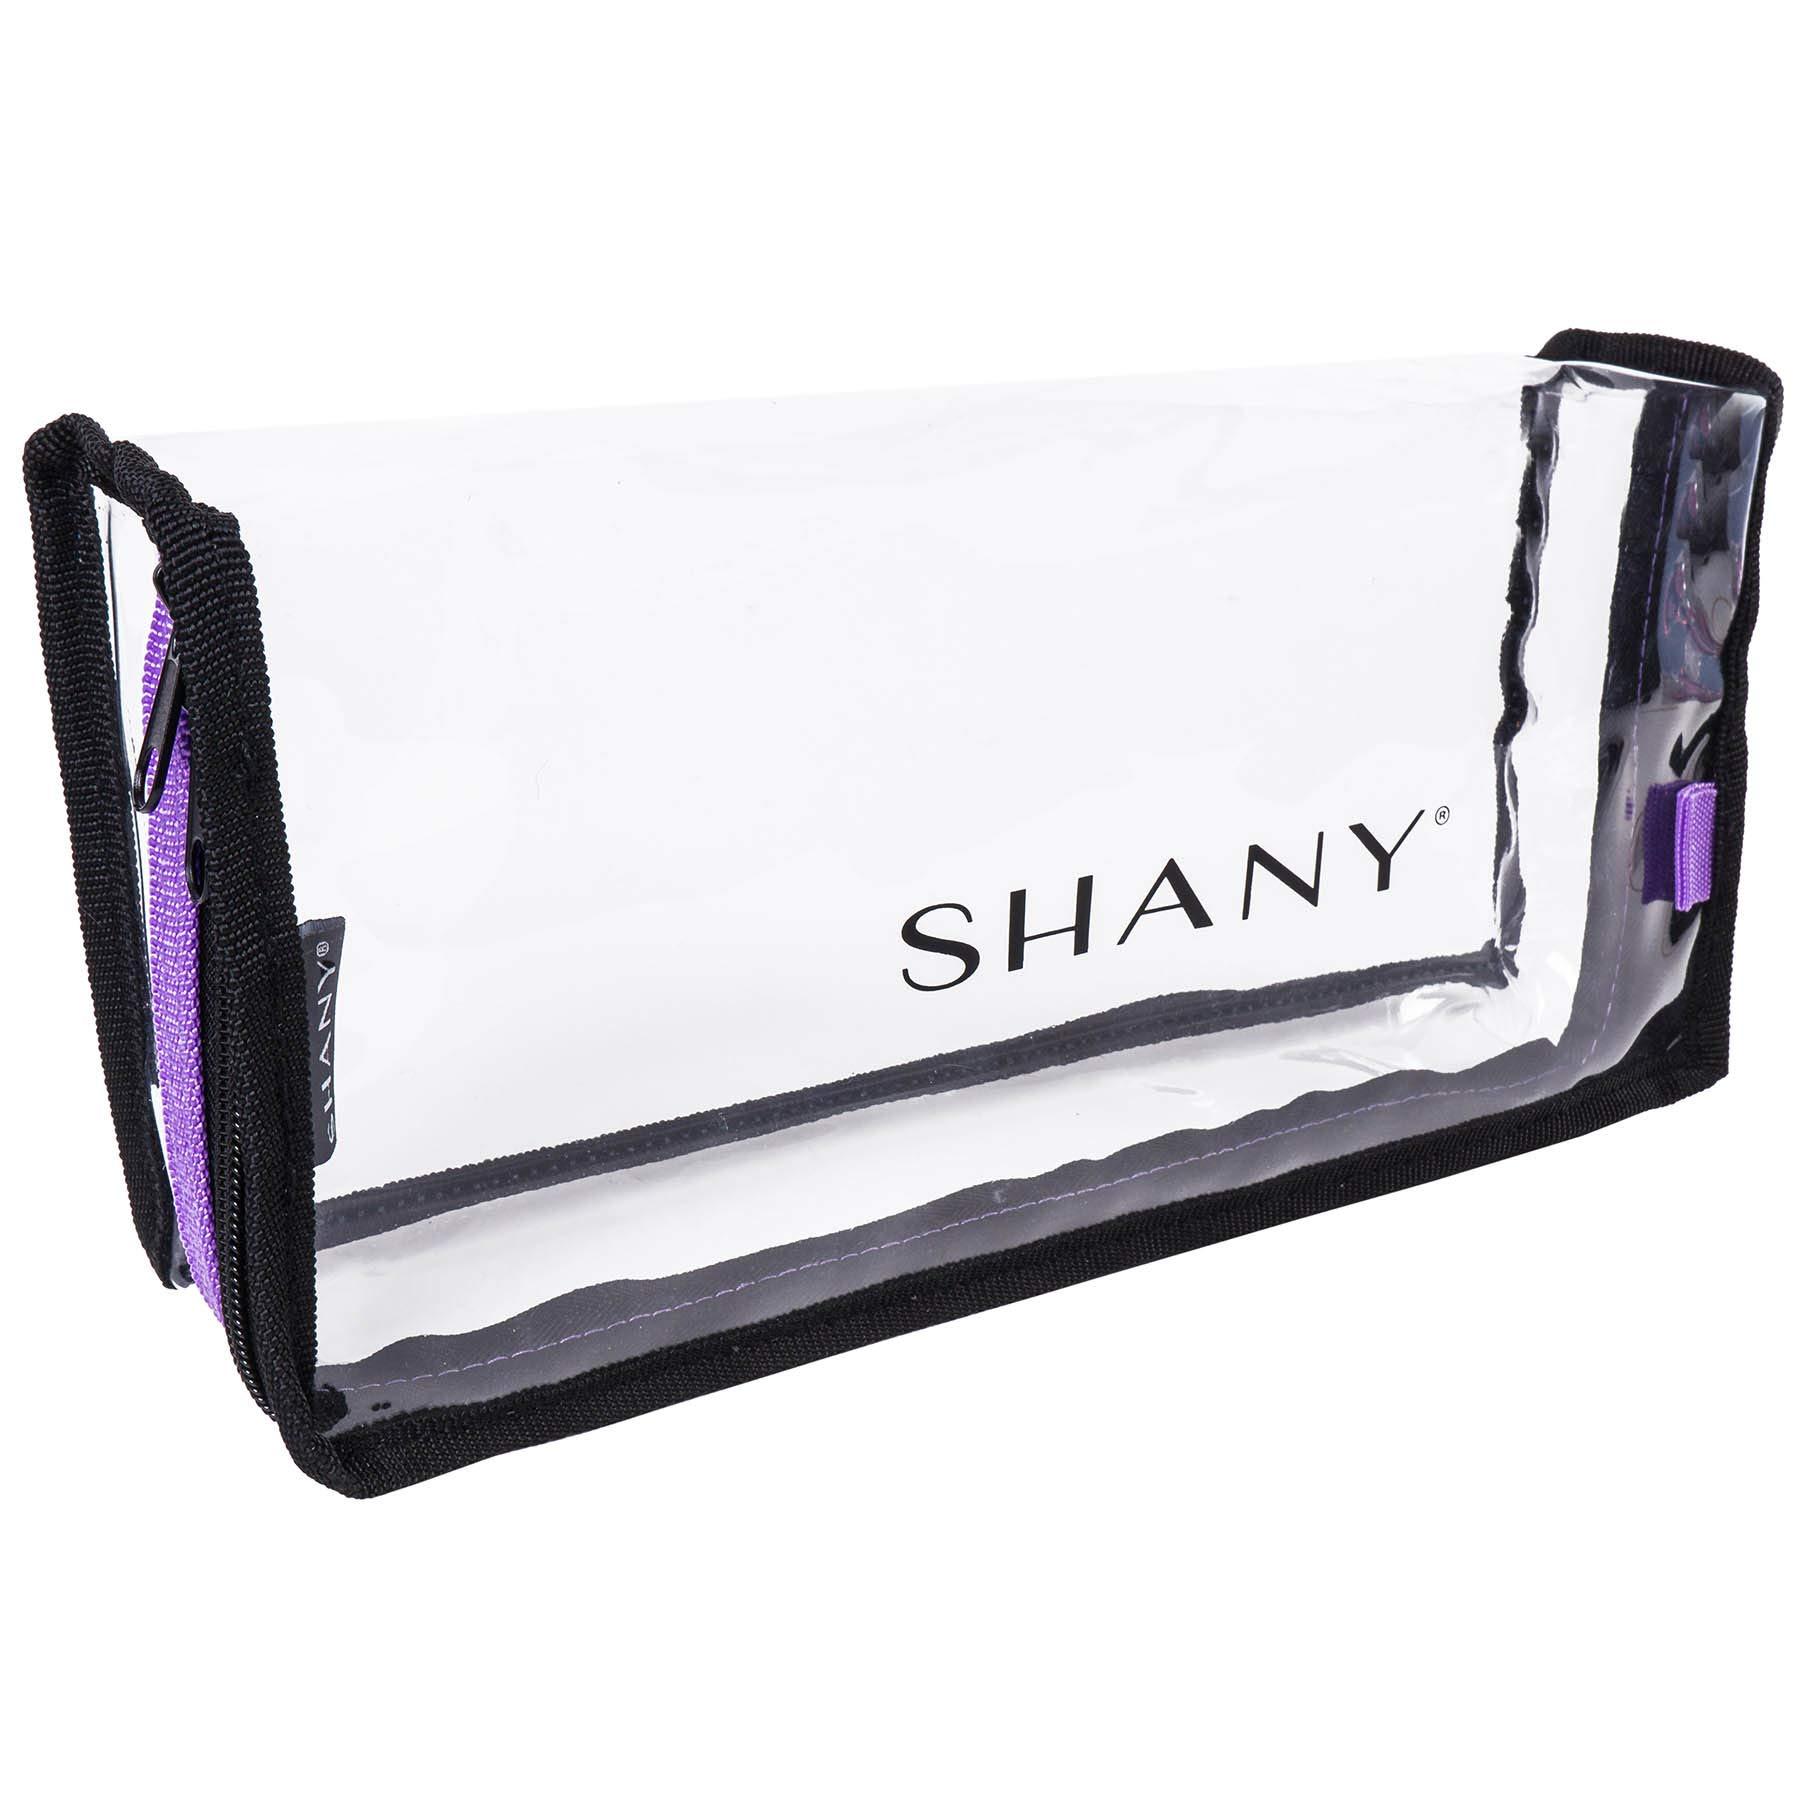 e3994514cdba SHANY Cosmetics Traveling Makeup Artist Bag Set of 3 - Clear, Water ...